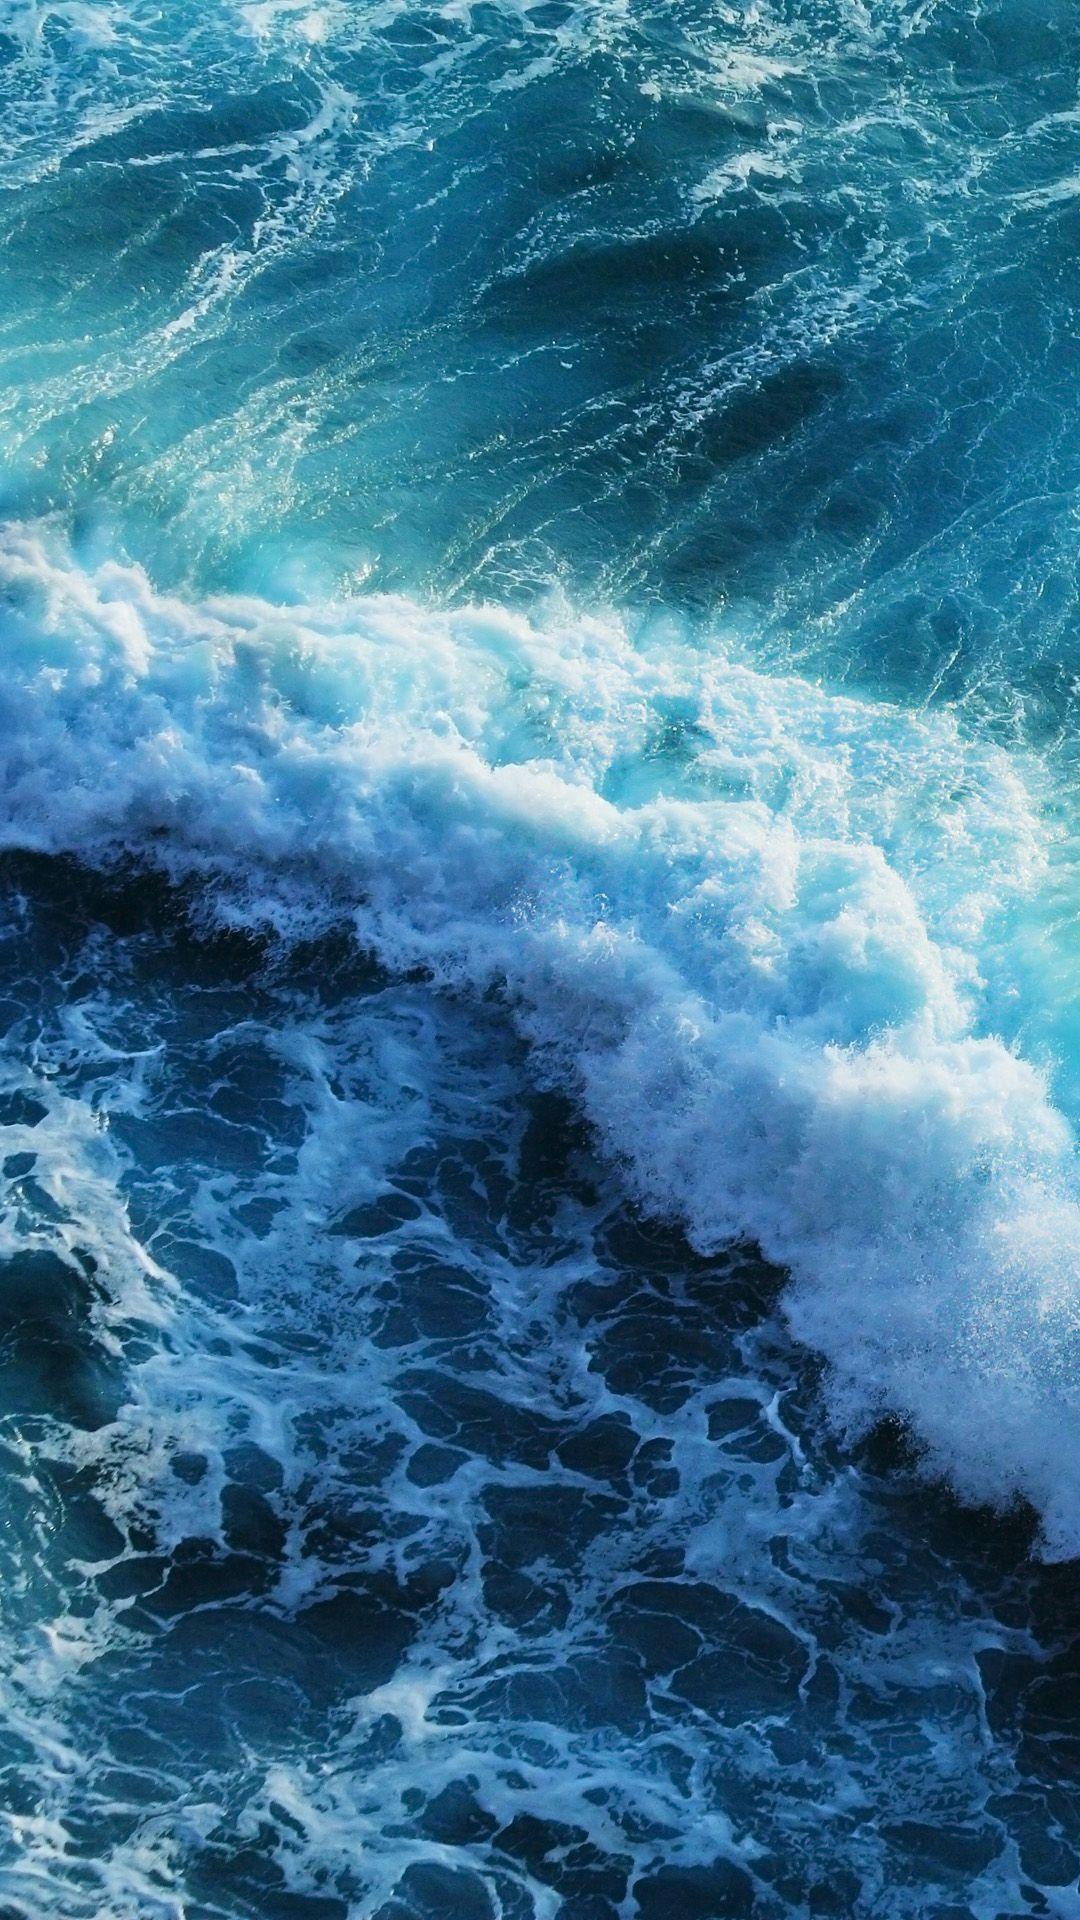 600 Wallpaper Iphone Sea HD Paling Baru